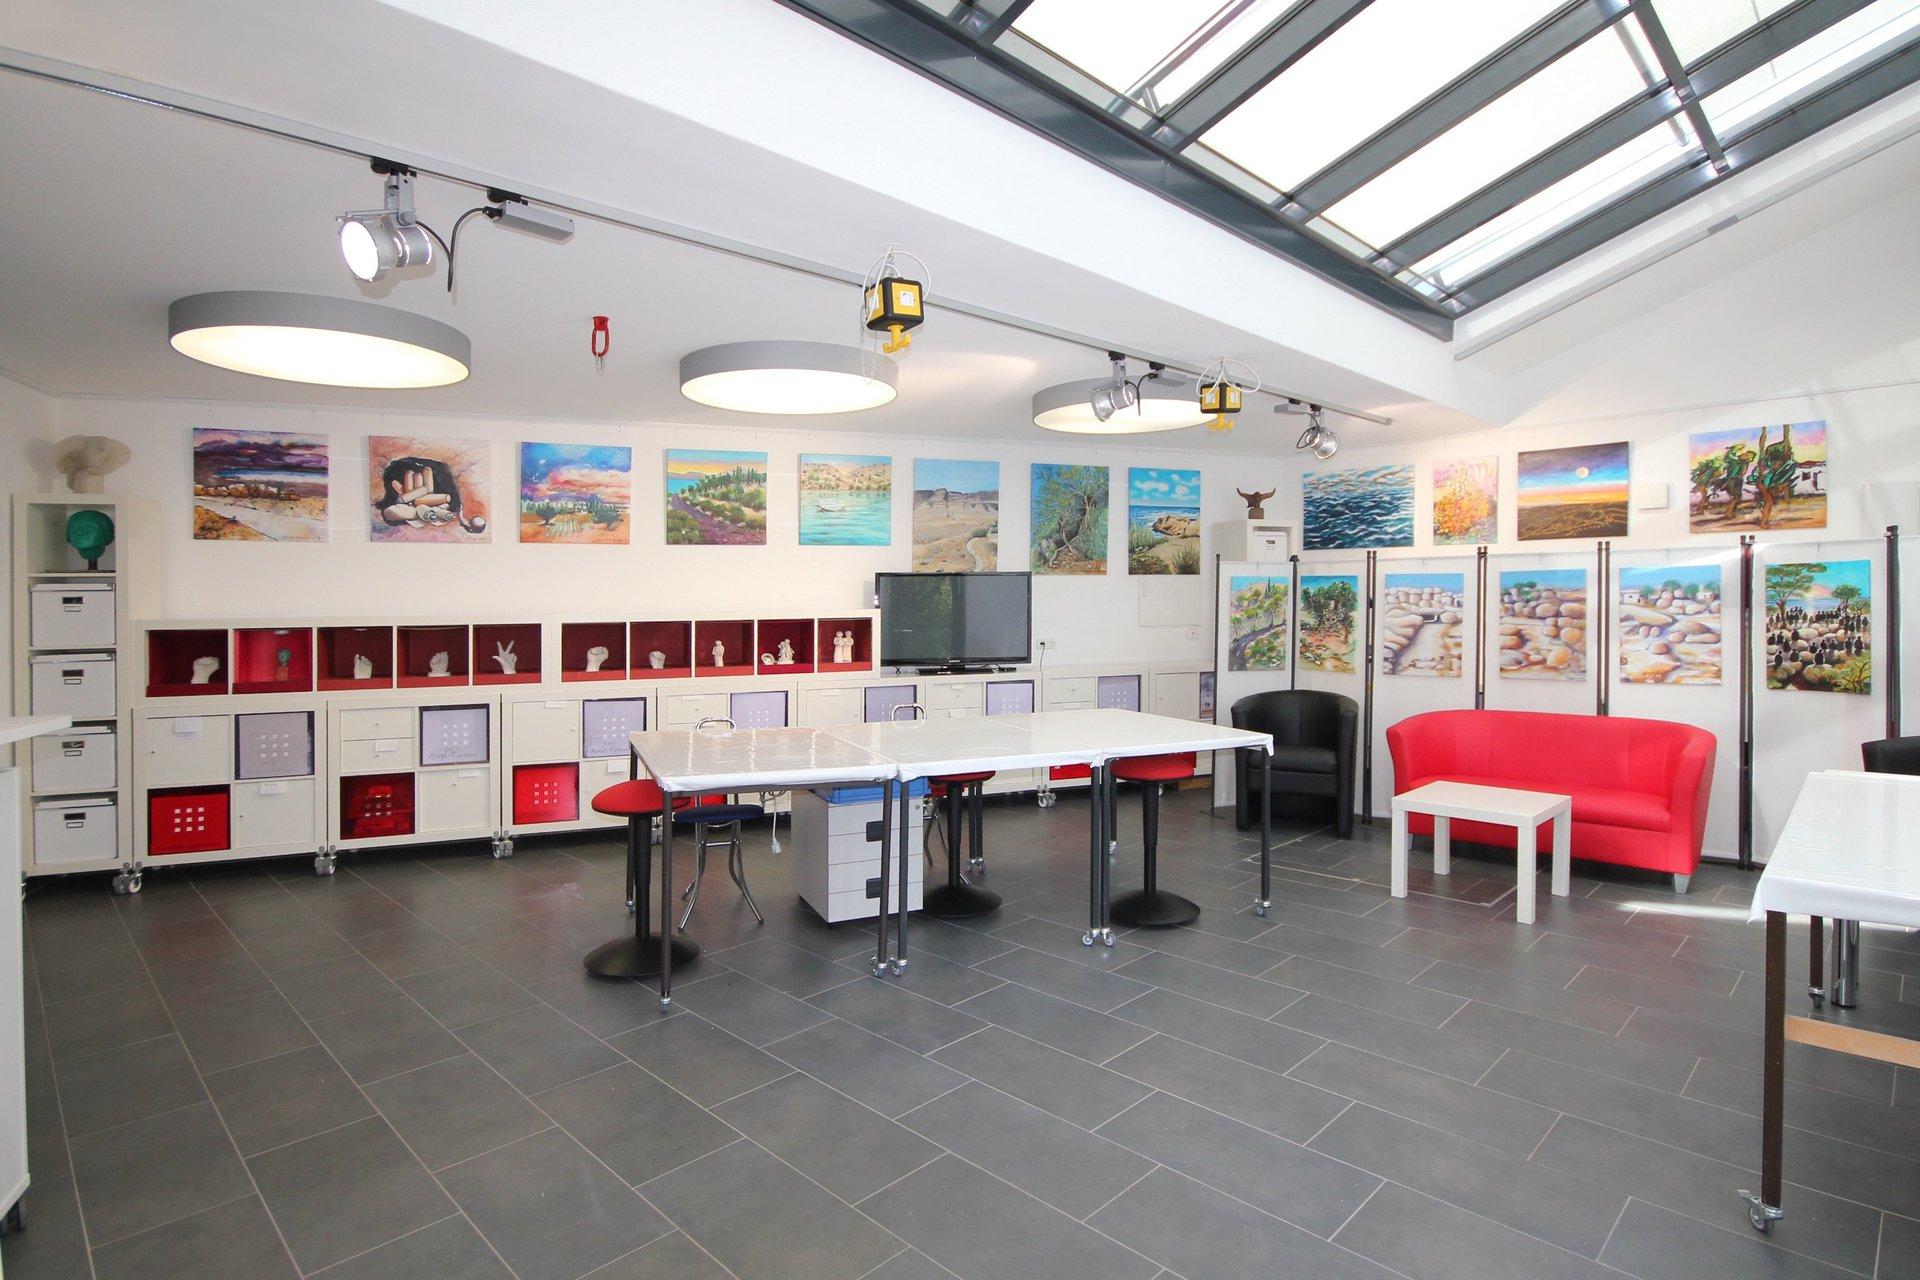 Kunstatelier, Galerie, augsburg, Malerei, Figuren, Beton, Keramik, Bronze